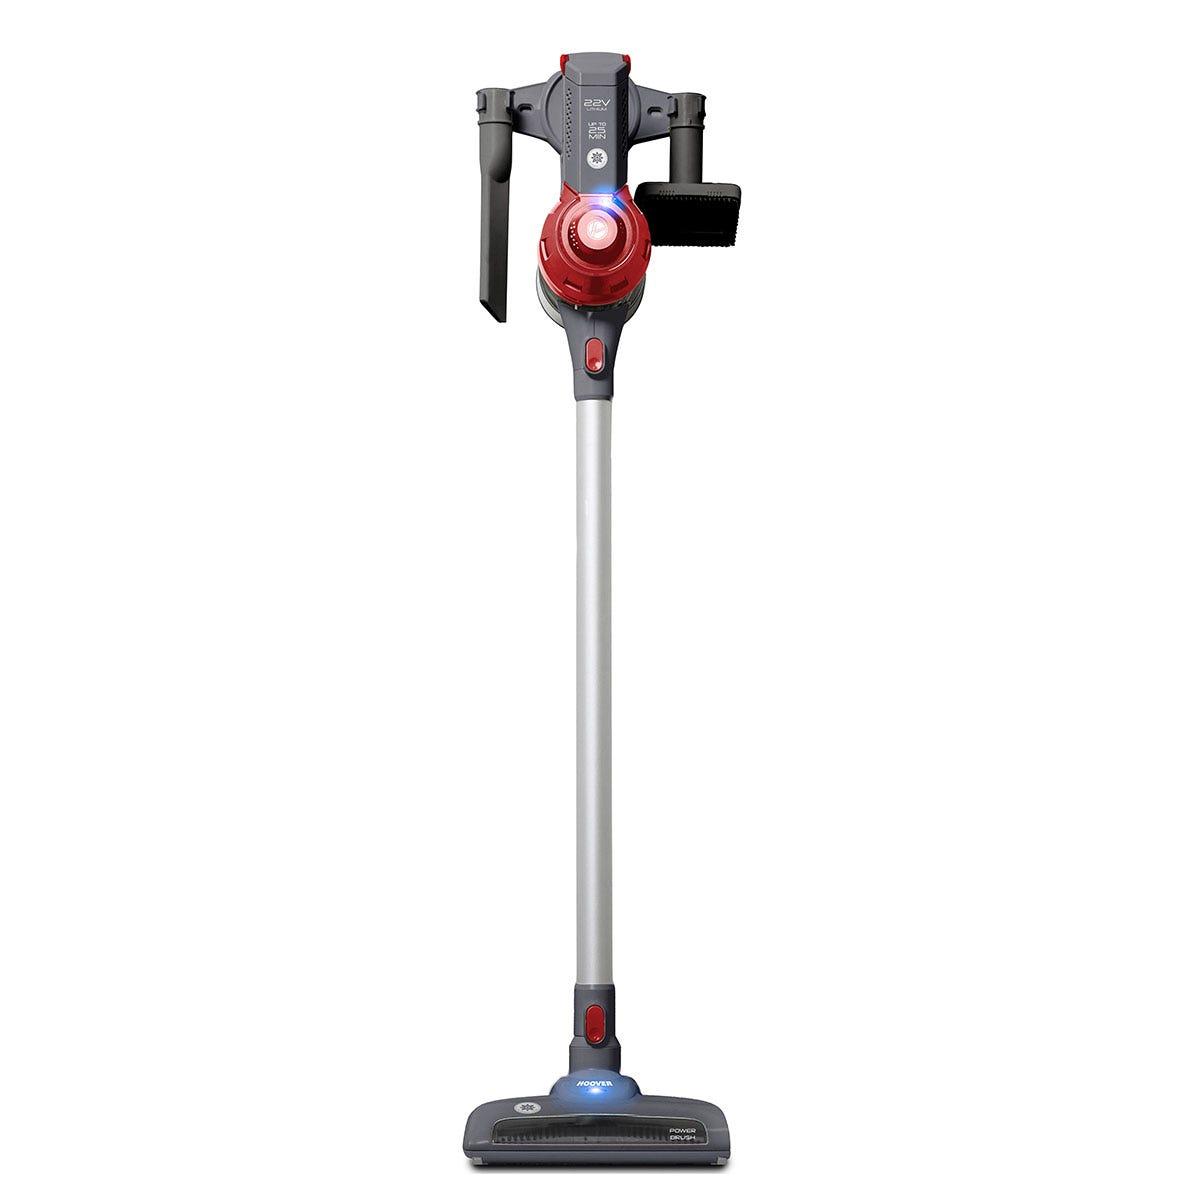 JML Hoover Freedom Allergy Stick 3-in-1 Vacuum Cleaner - Grey